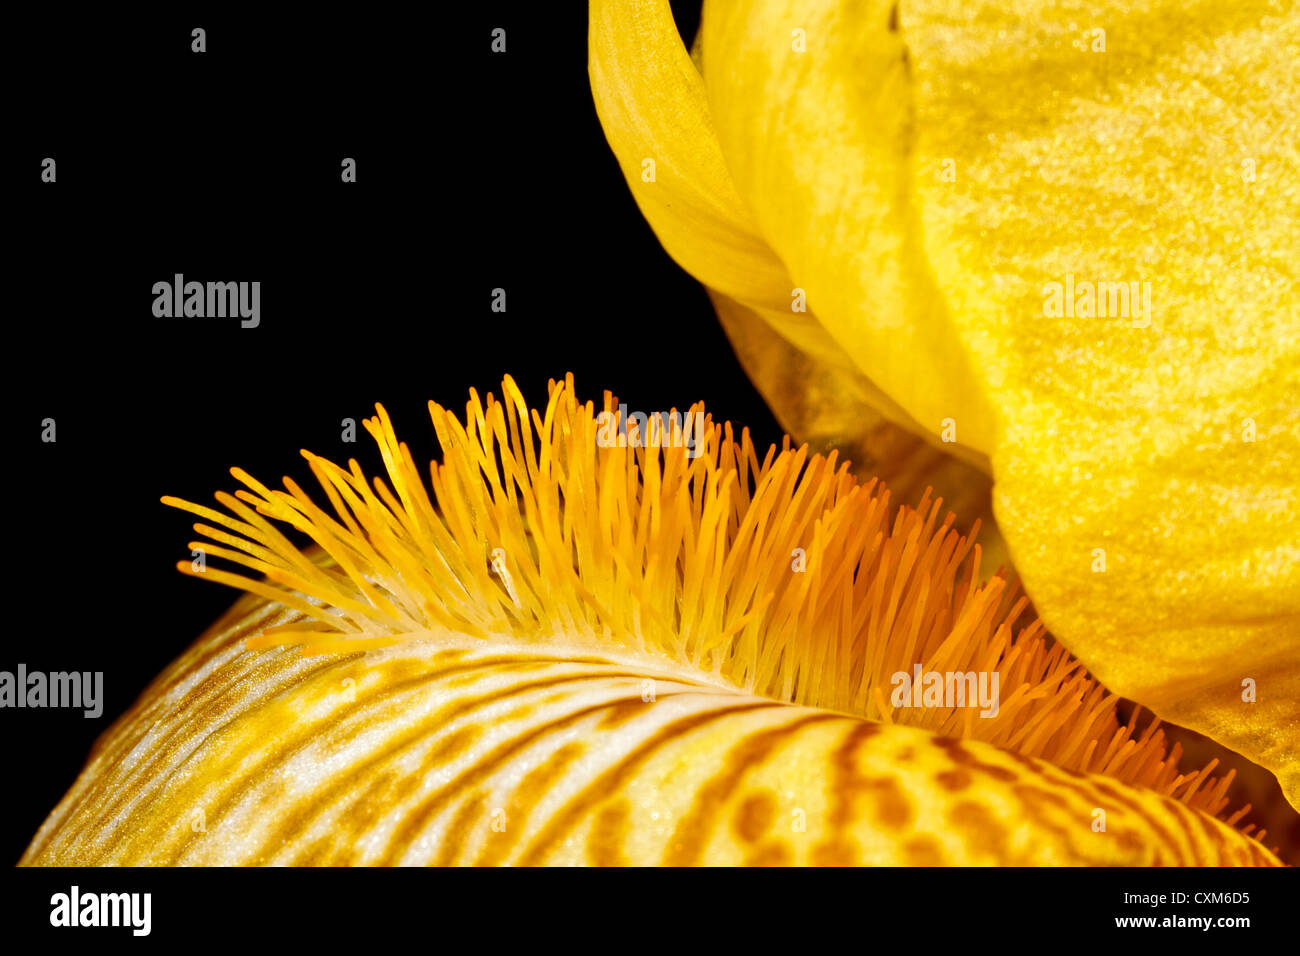 The Beard of a Yellow Iris - Stock Image